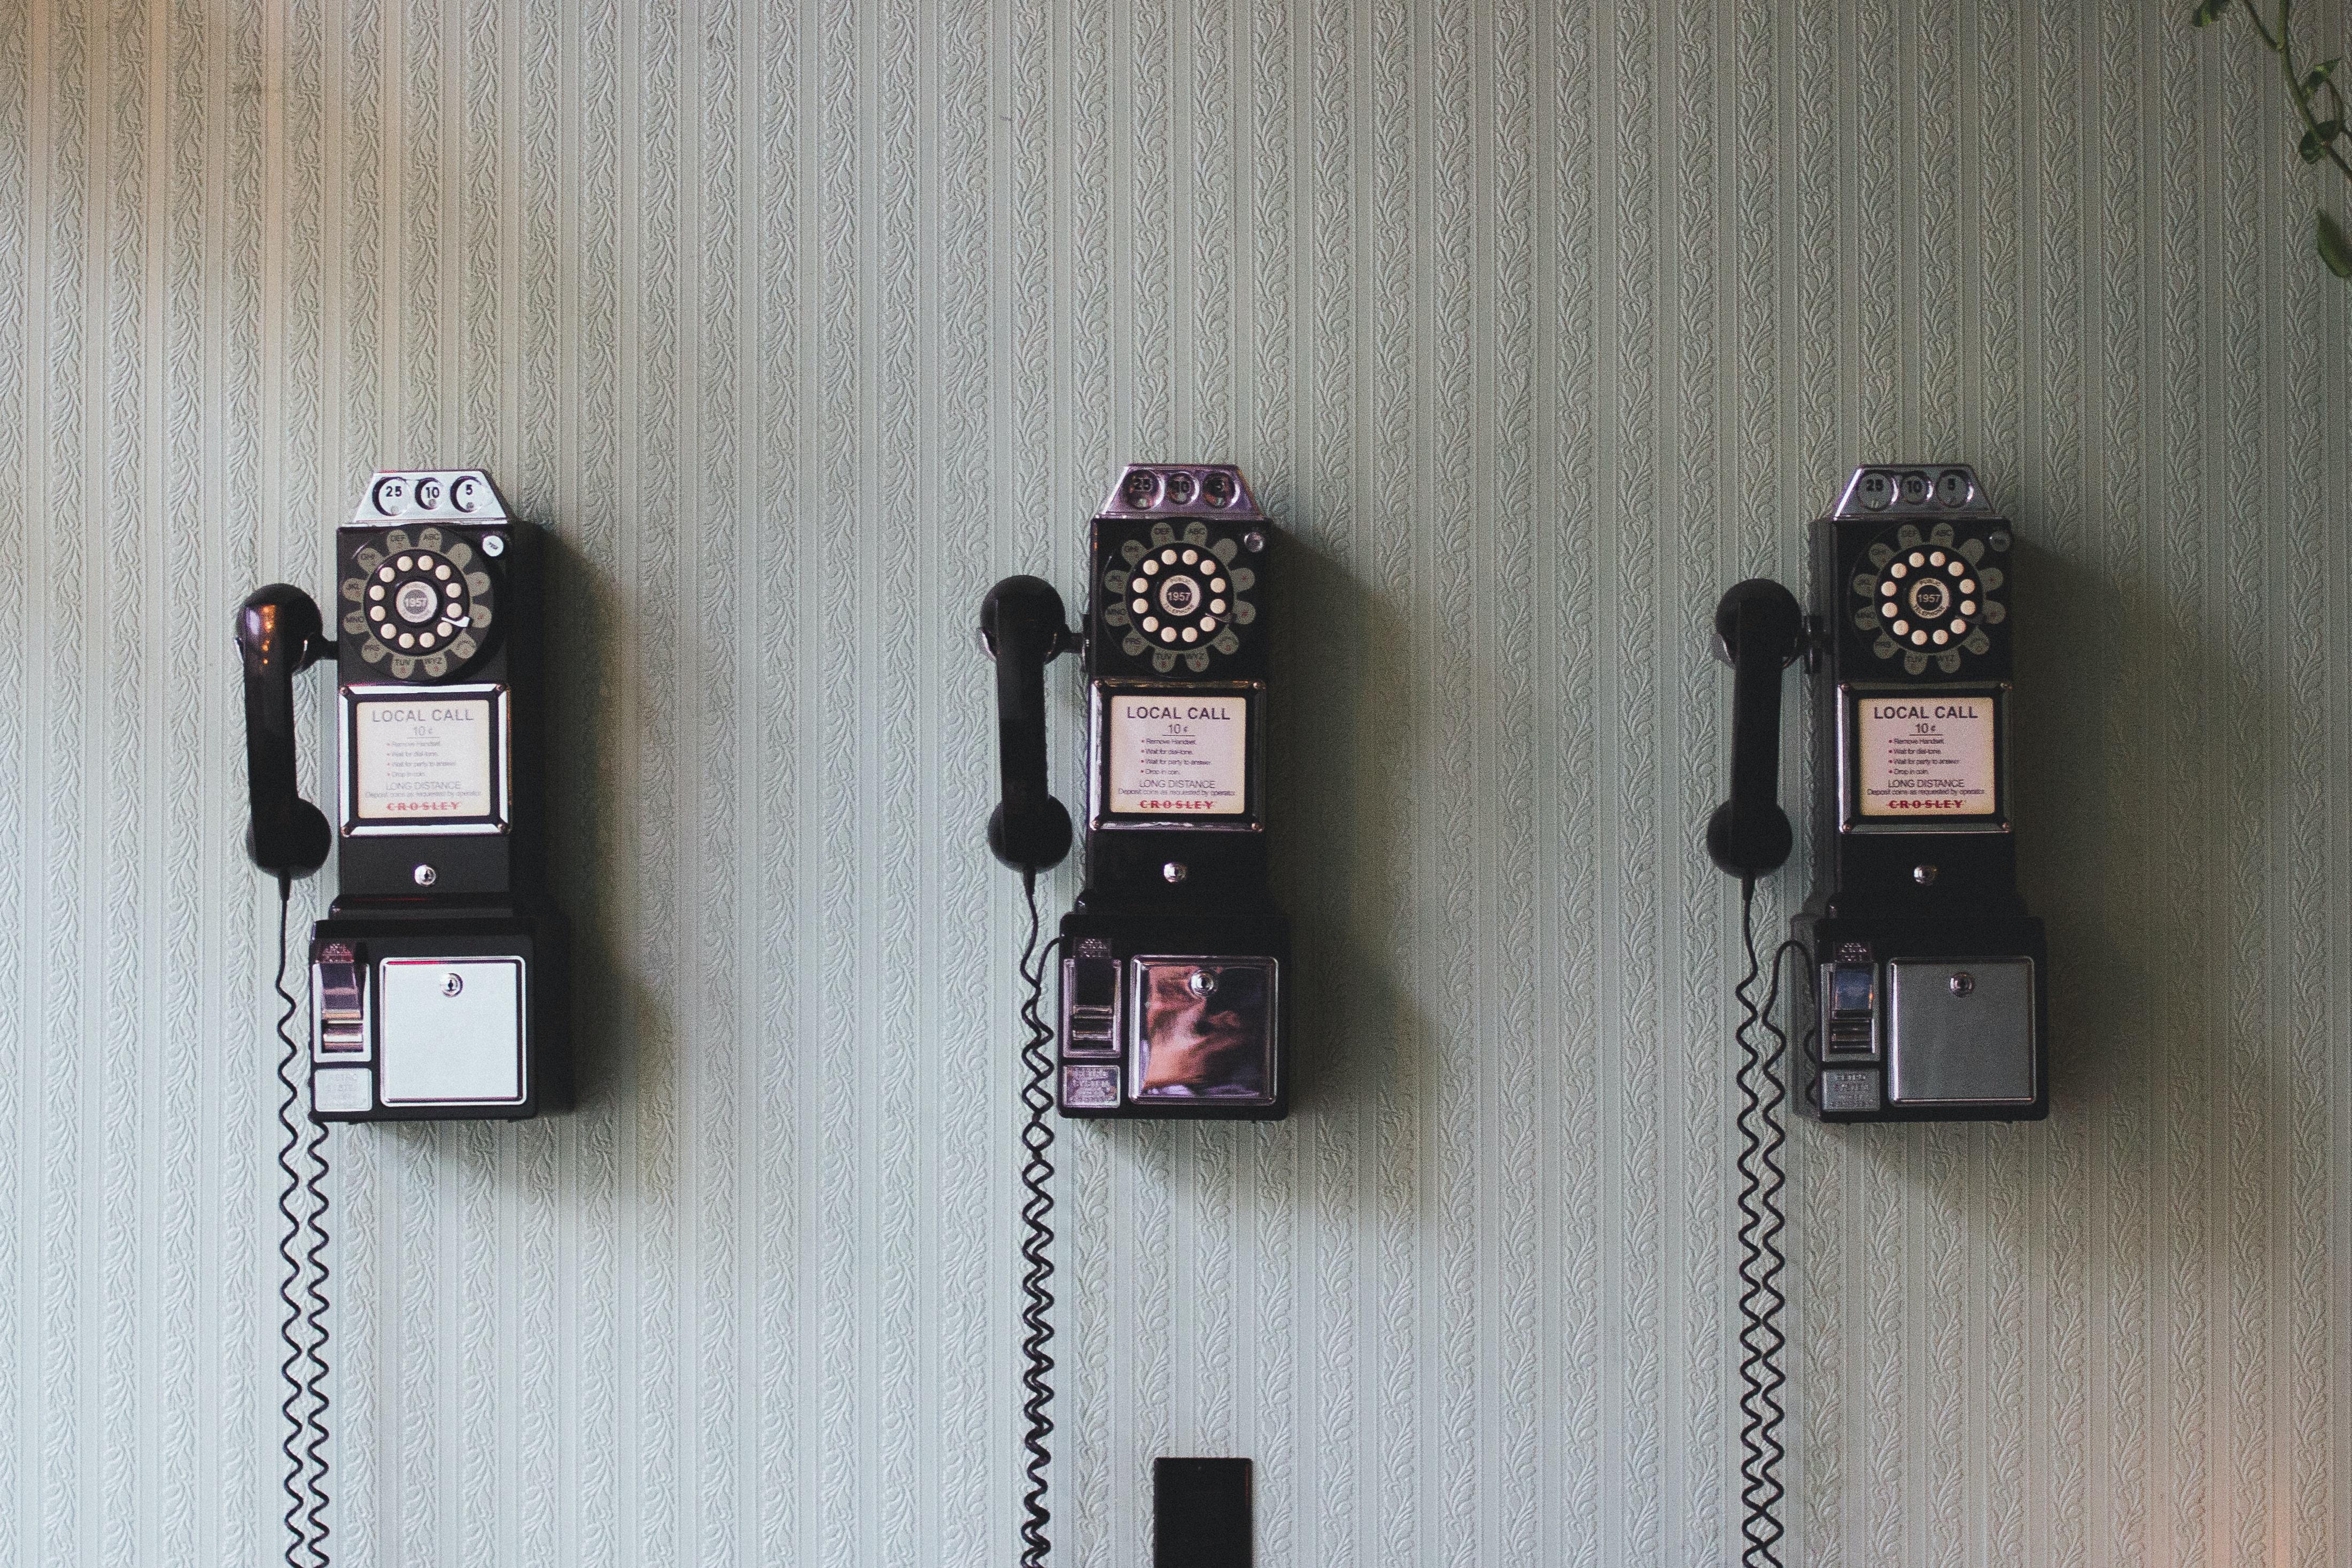 3 Pay phones